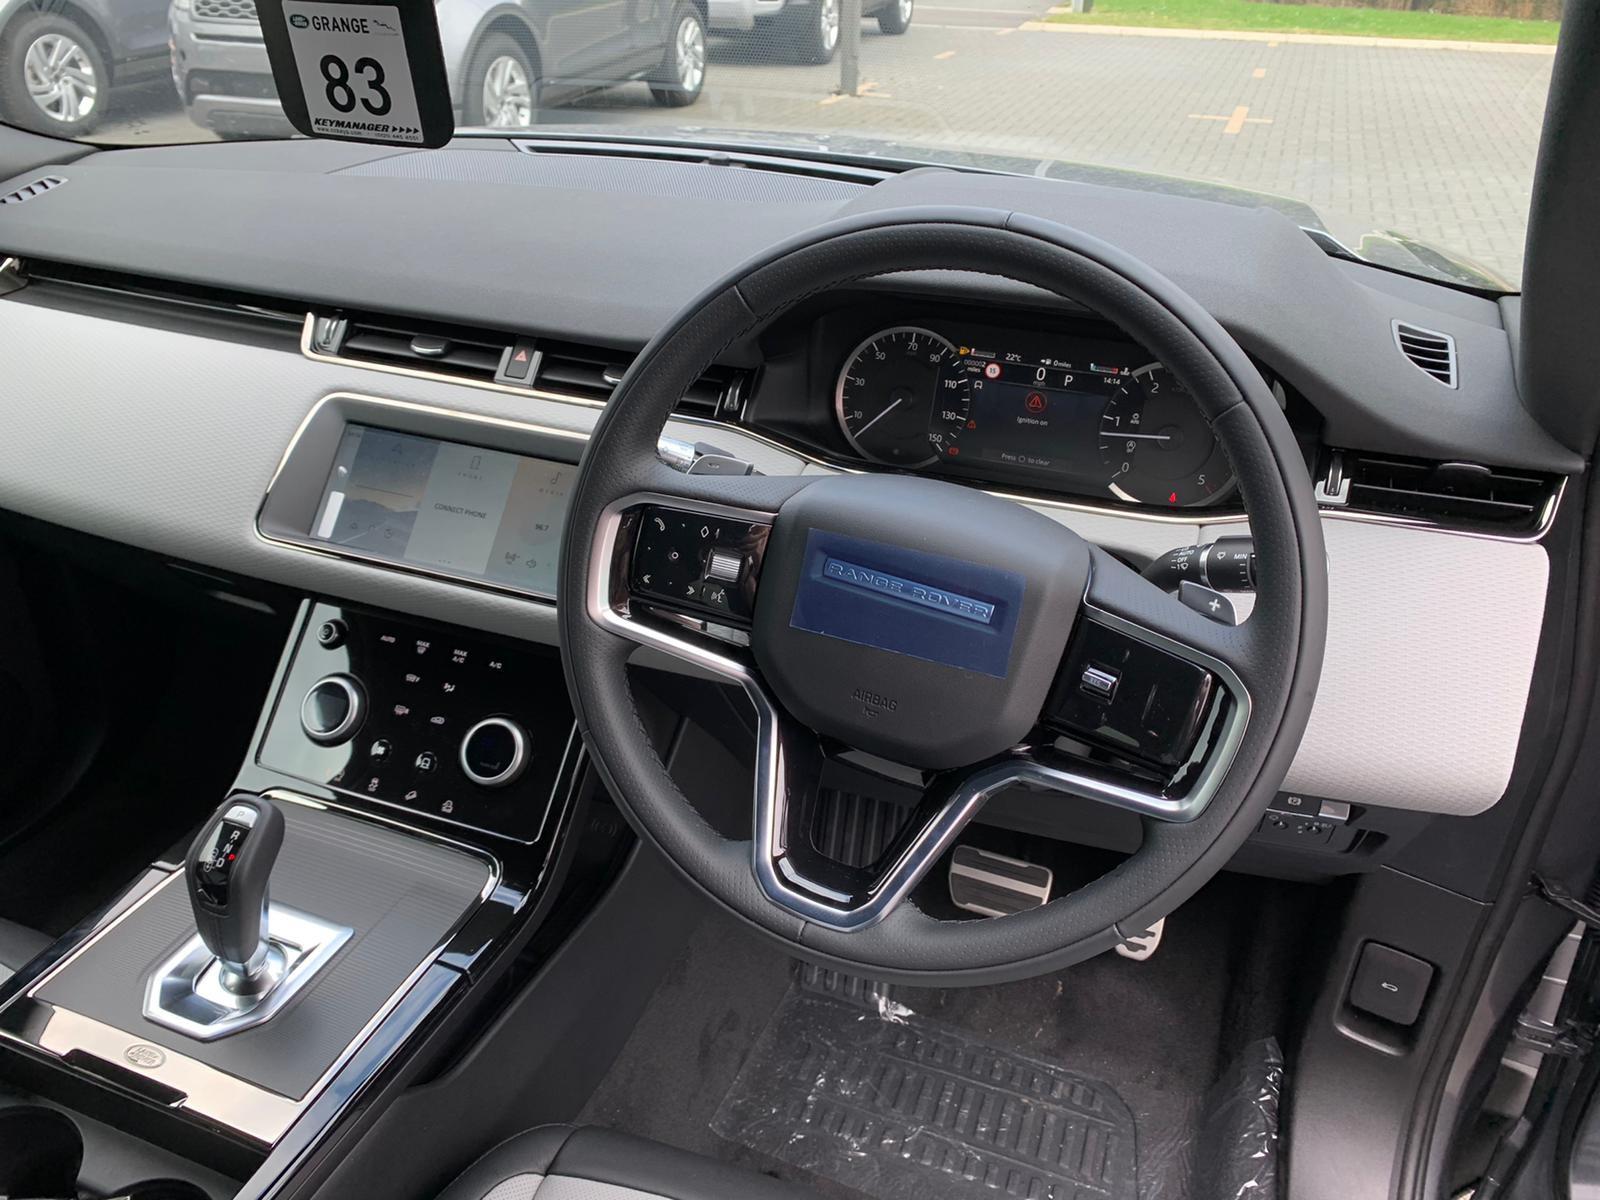 Land Rover New Range Rover Evoque AWD Auto R-Dynamic S image 5